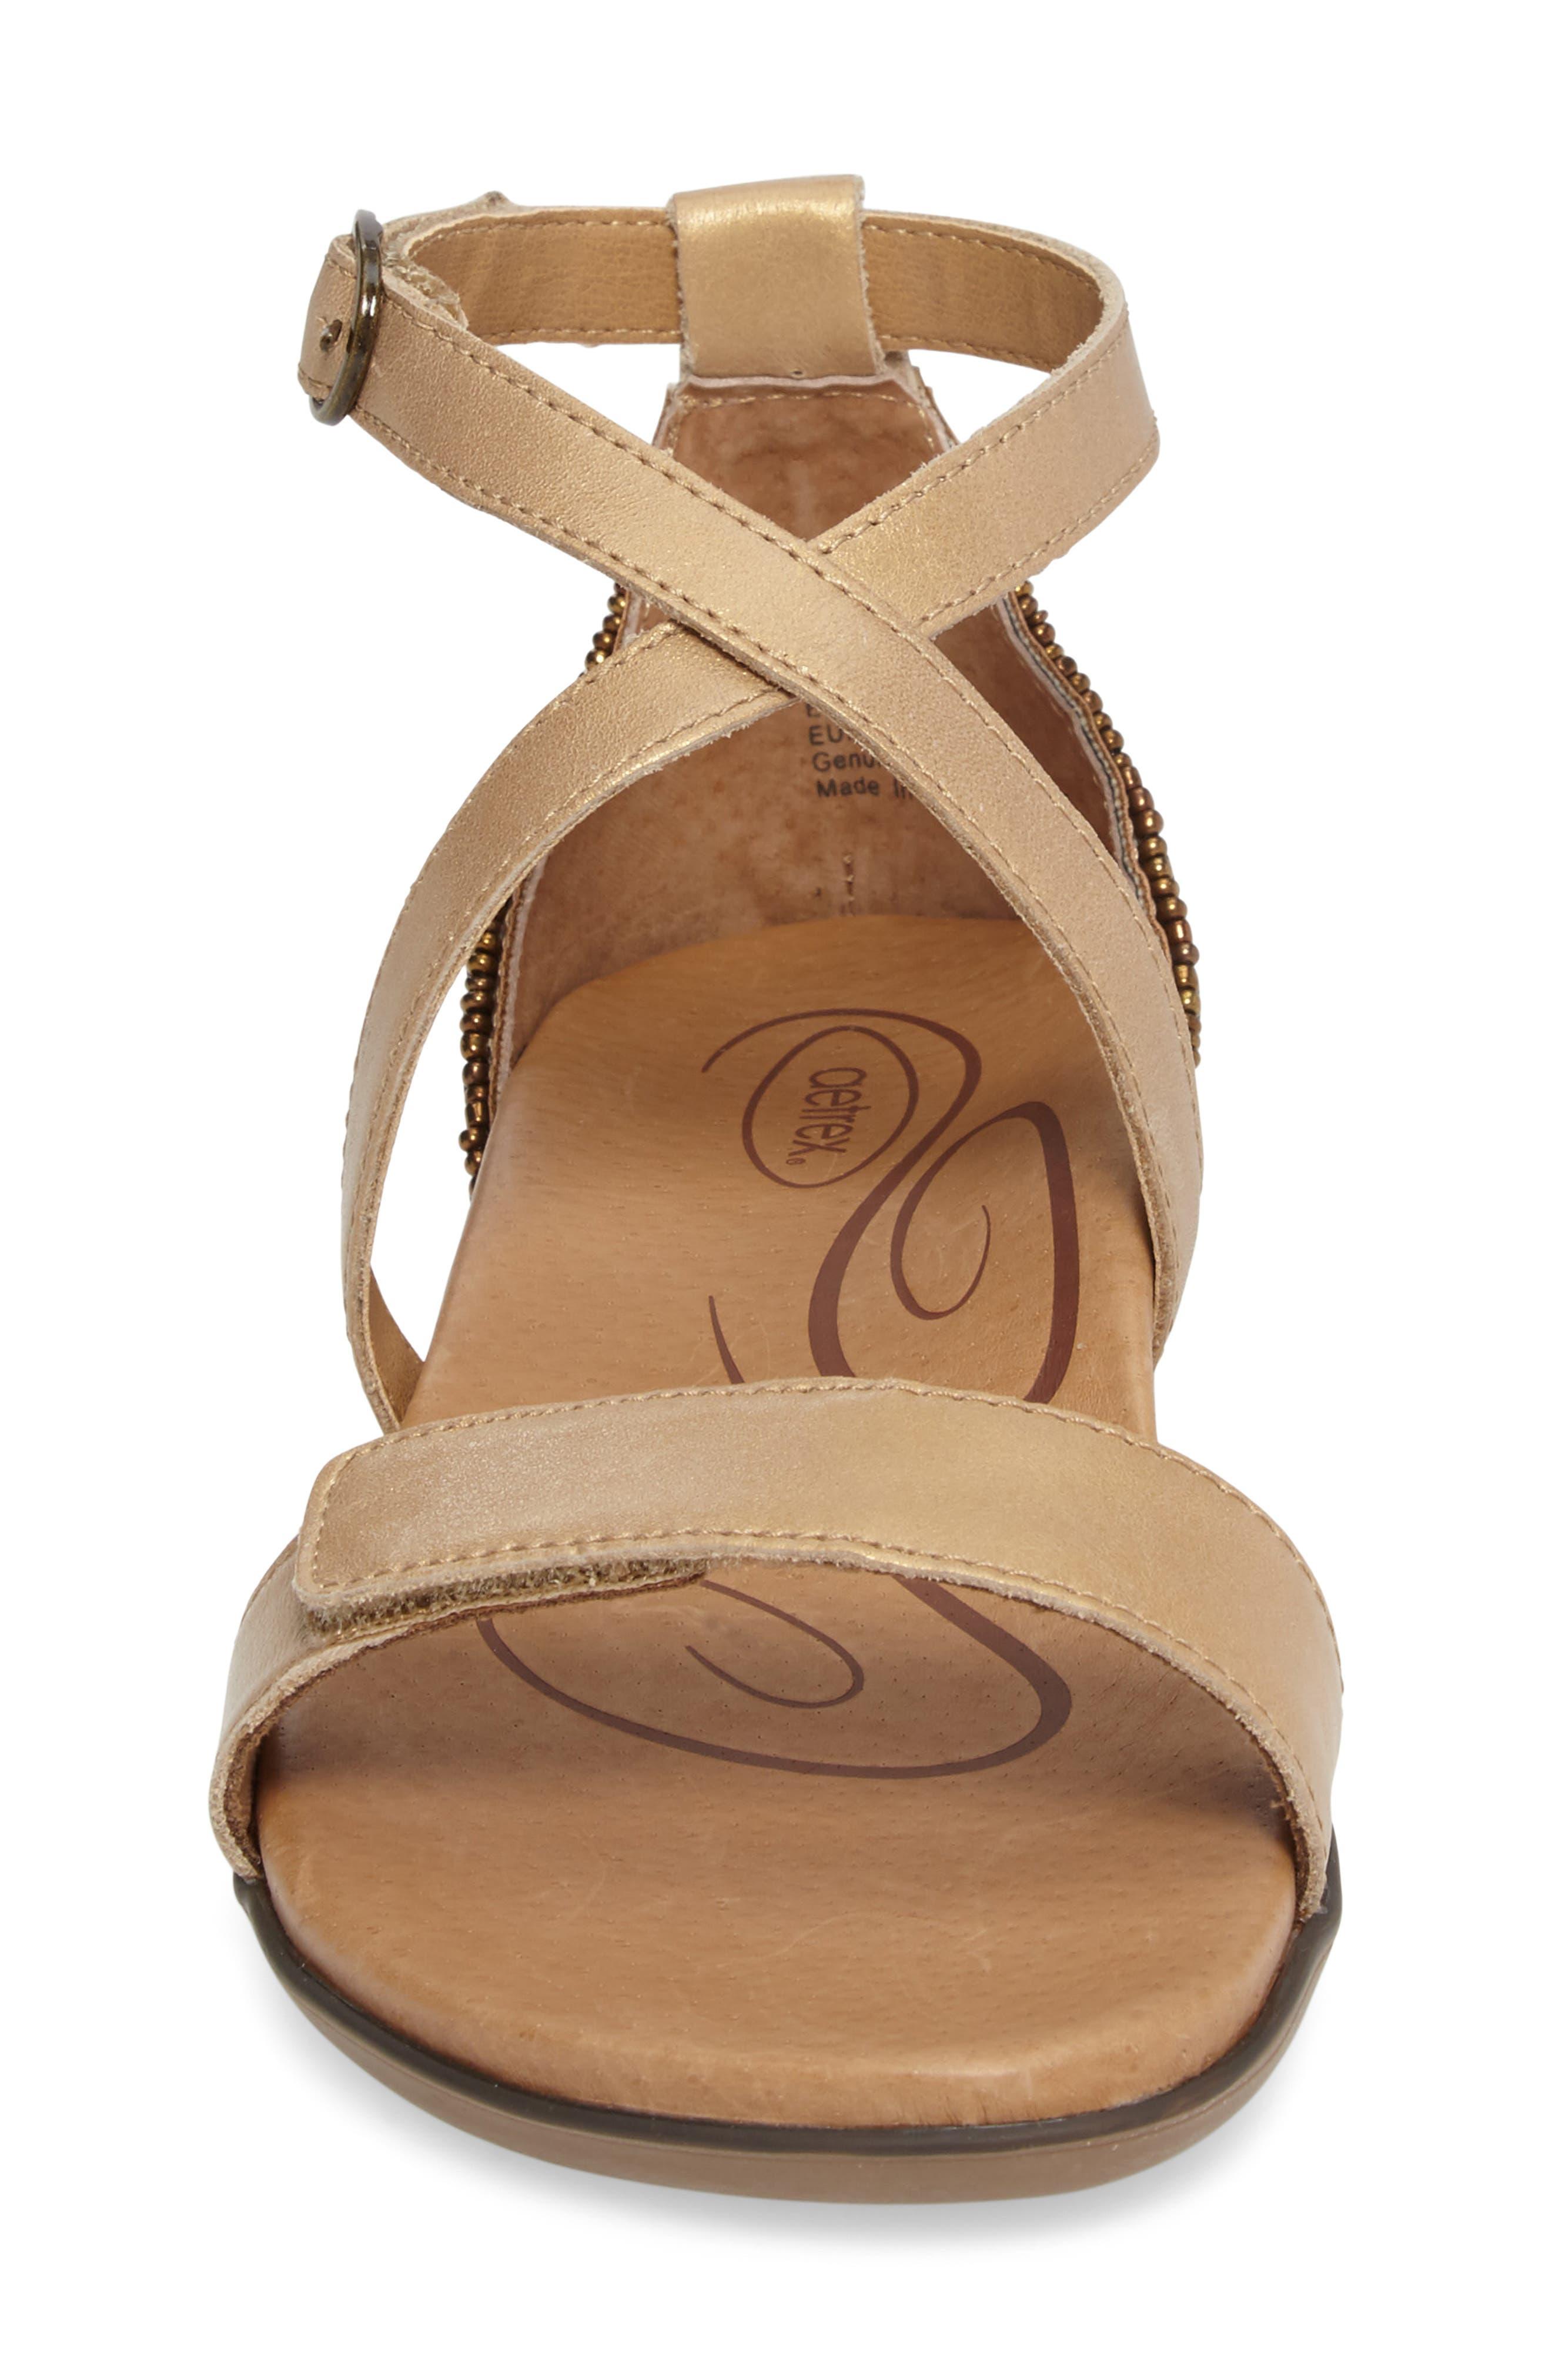 Brenda Embellished Cross Strap Sandal,                             Alternate thumbnail 4, color,                             Stone Leather